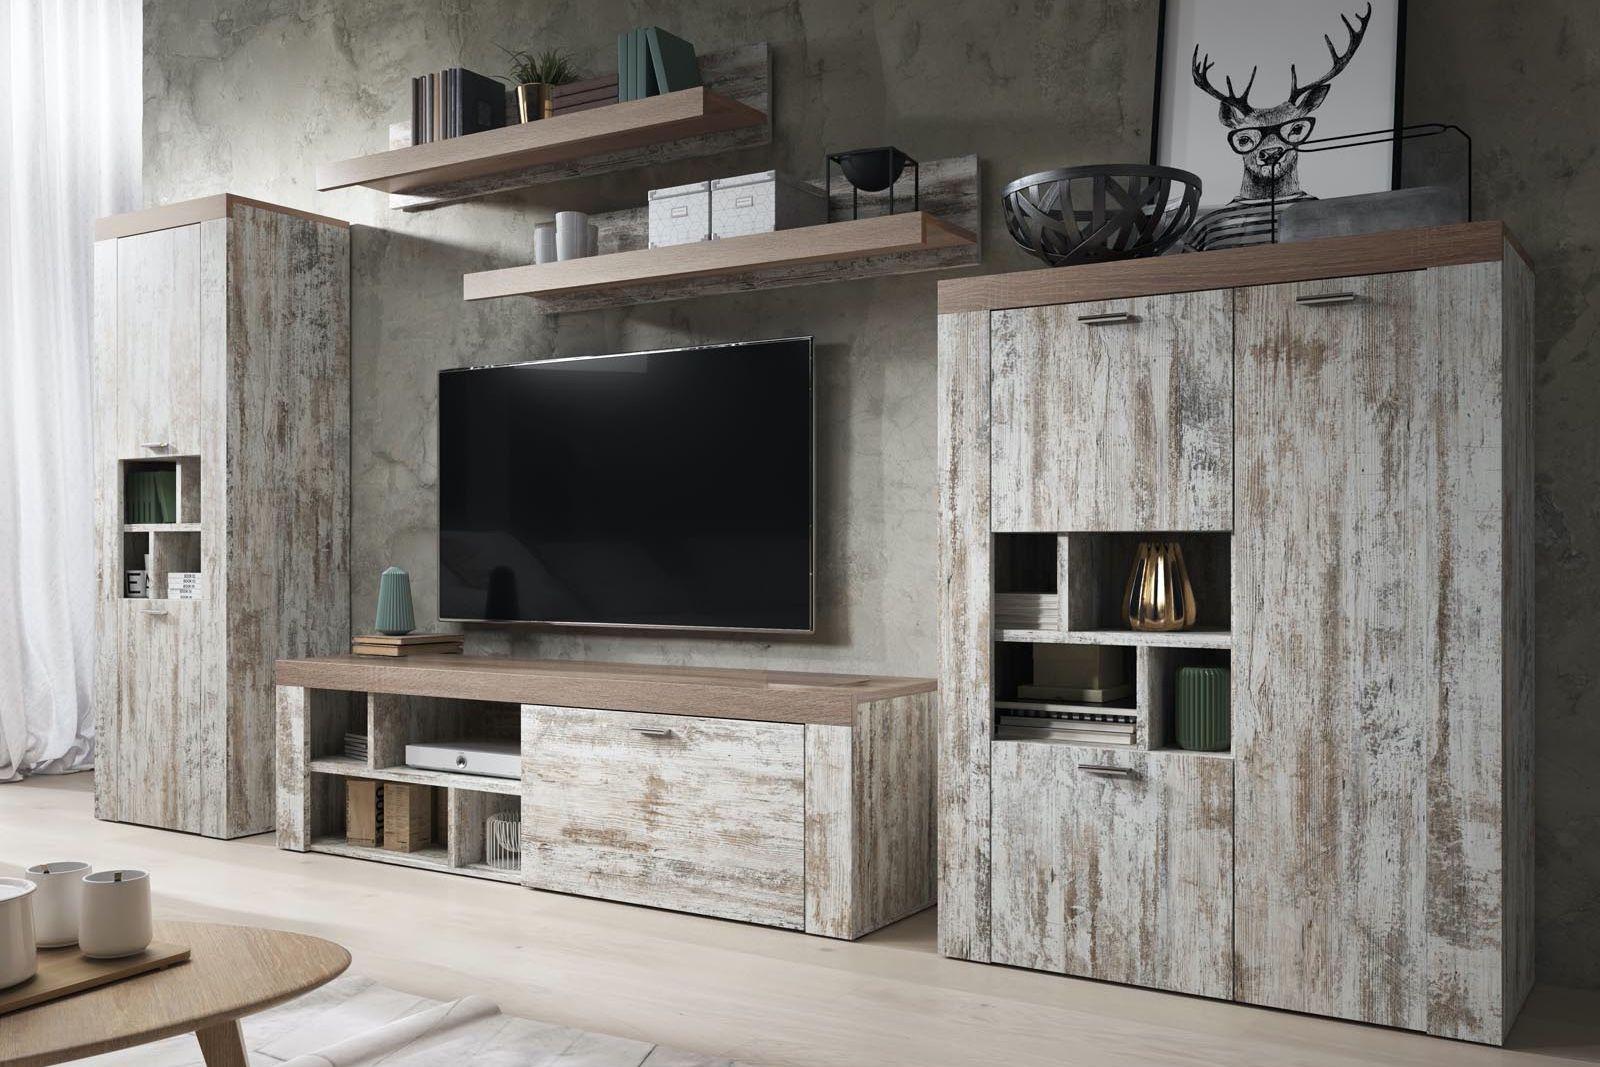 Mur Tv Hifi Army Pin Blanc Canyon Sonoma Truffe Mur Tv Mobilier De Salon Meuble Tv Hifi